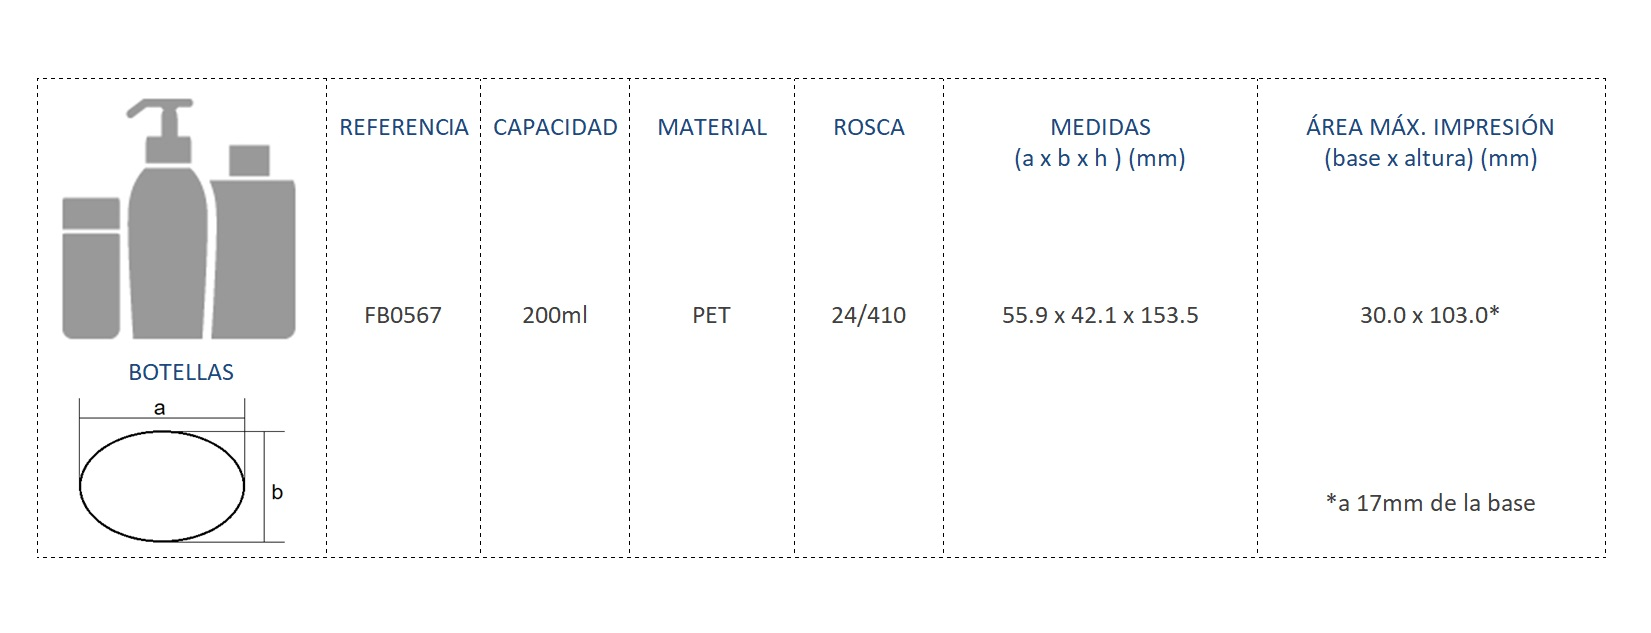 Cuadro de materiales botella FB0567